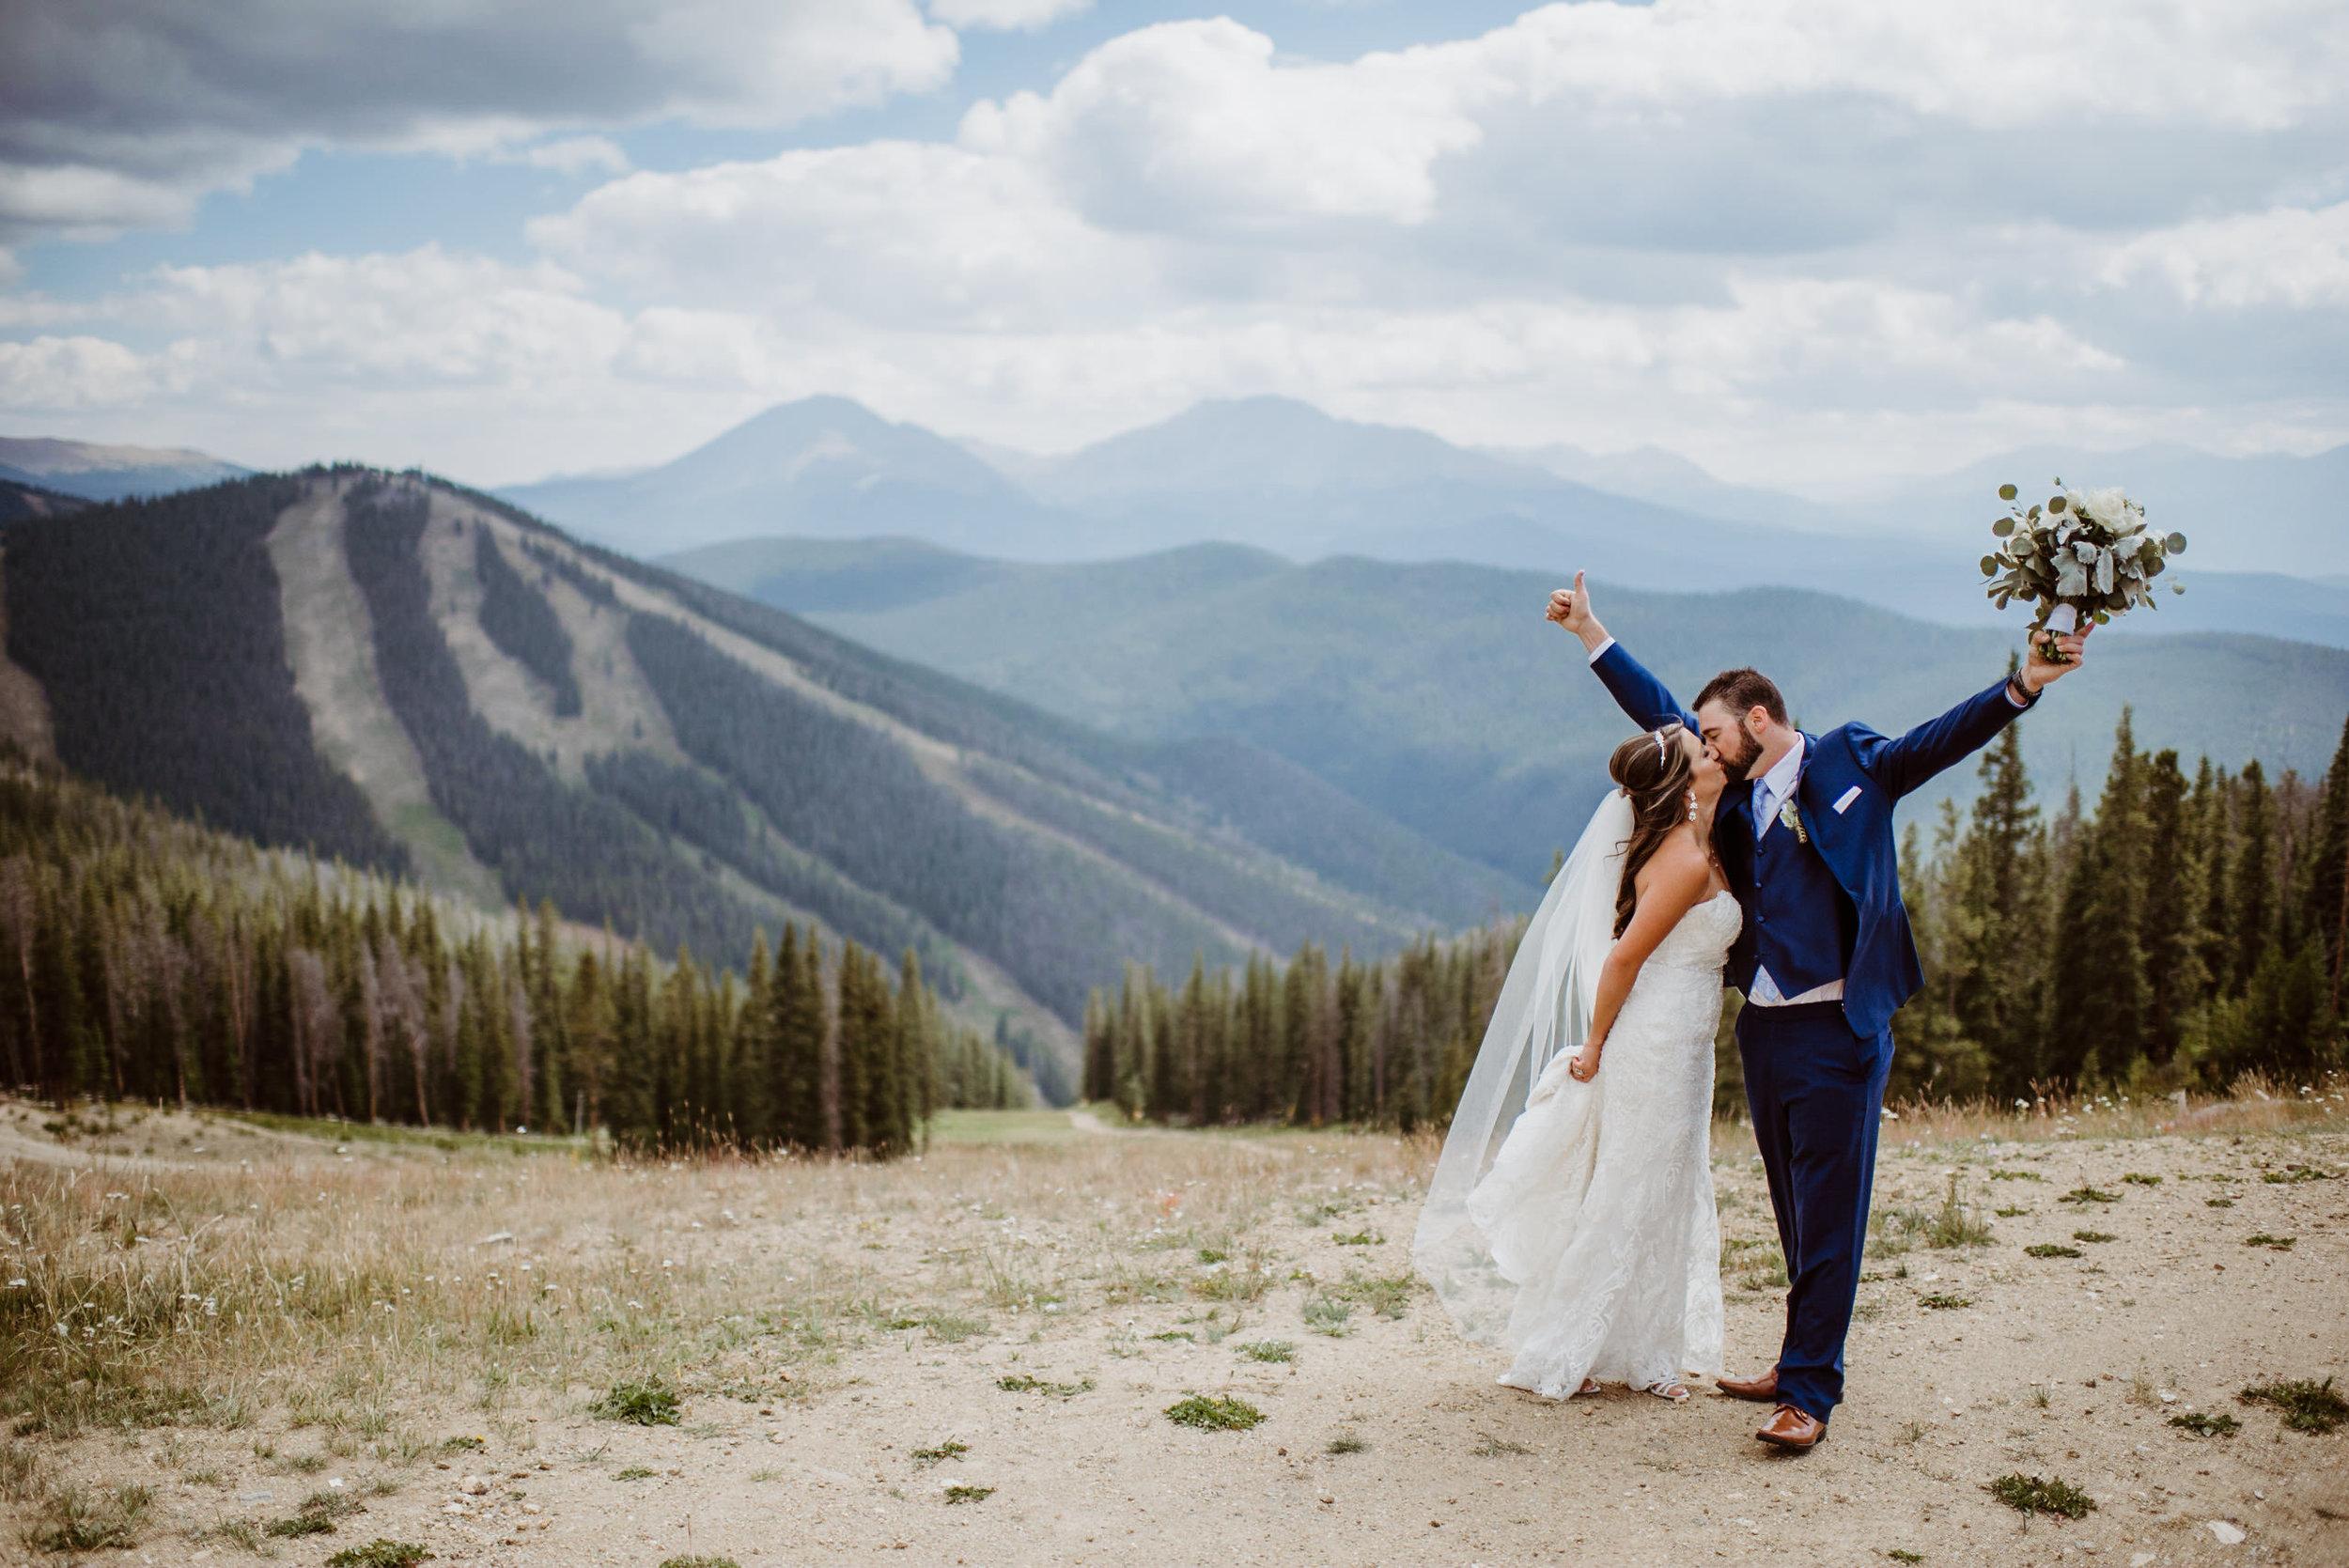 Keystone-Timber-Ridge-Mountain-Wedding-31.jpg